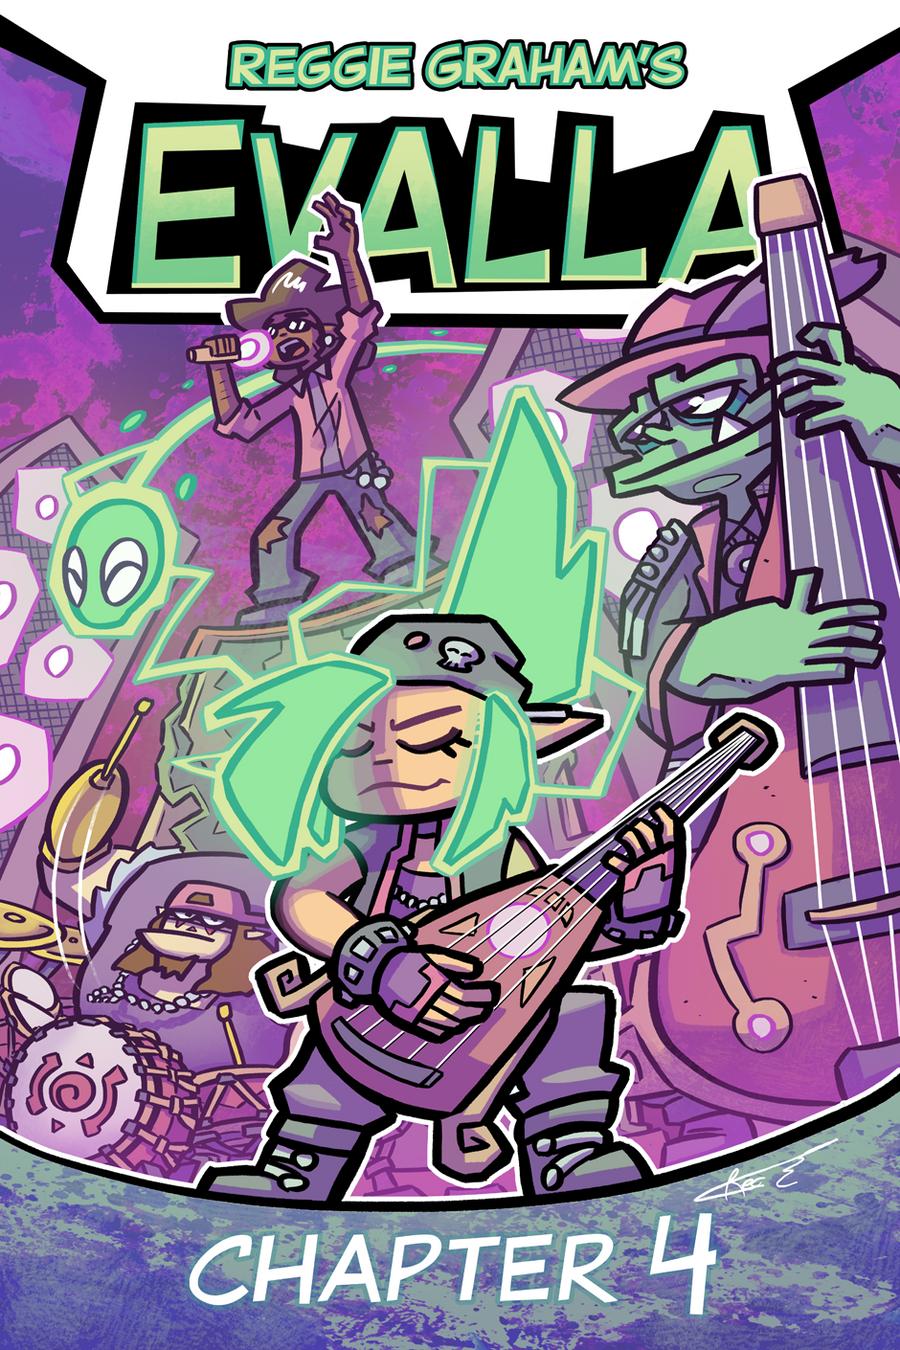 EVALLA Chapter 4 Cover by Ziggyfin